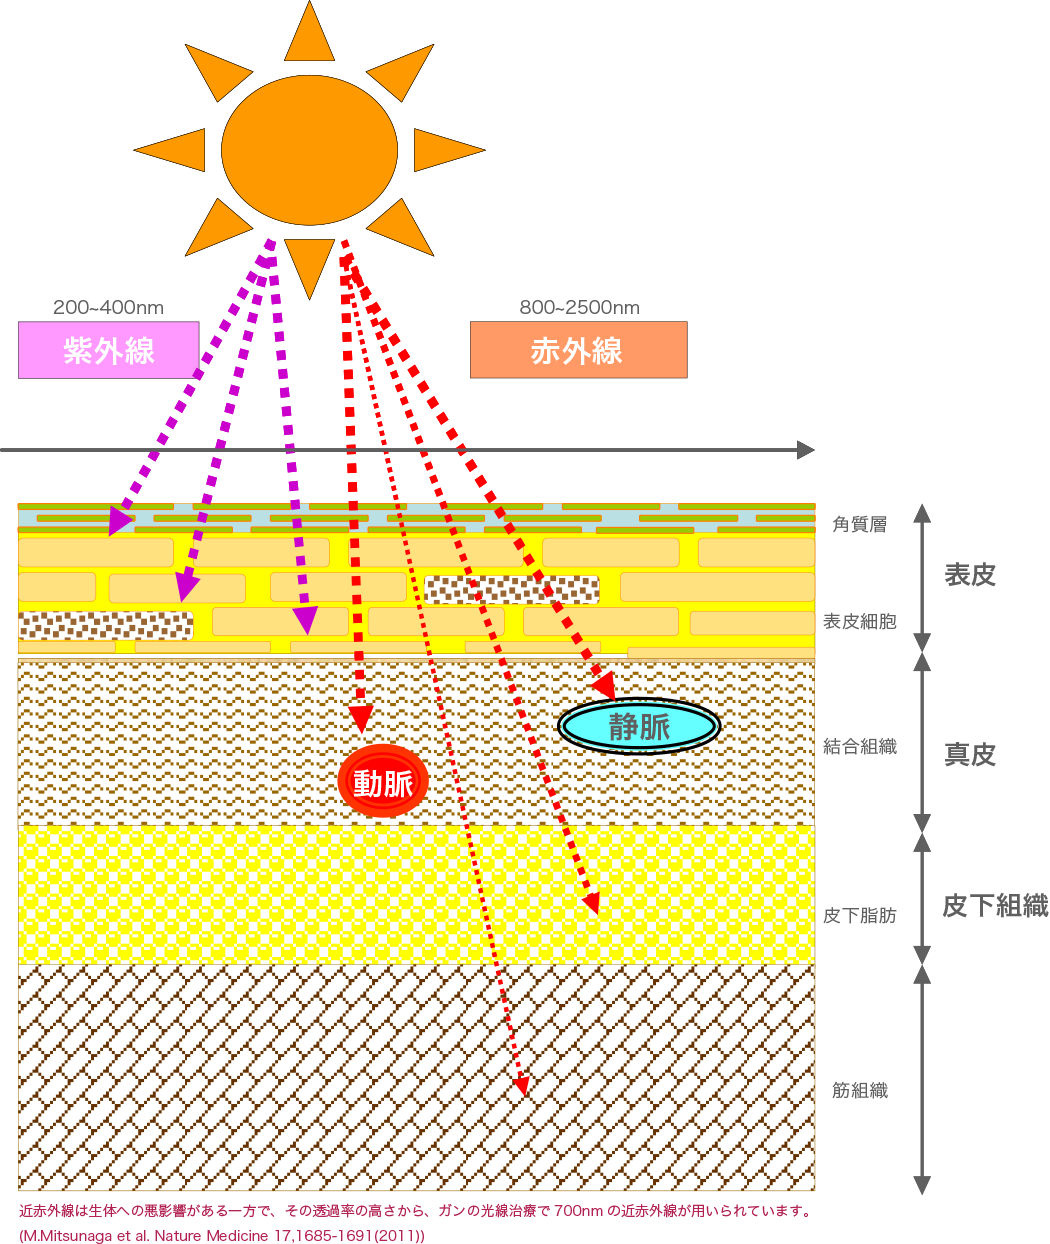 紫外線と赤外線